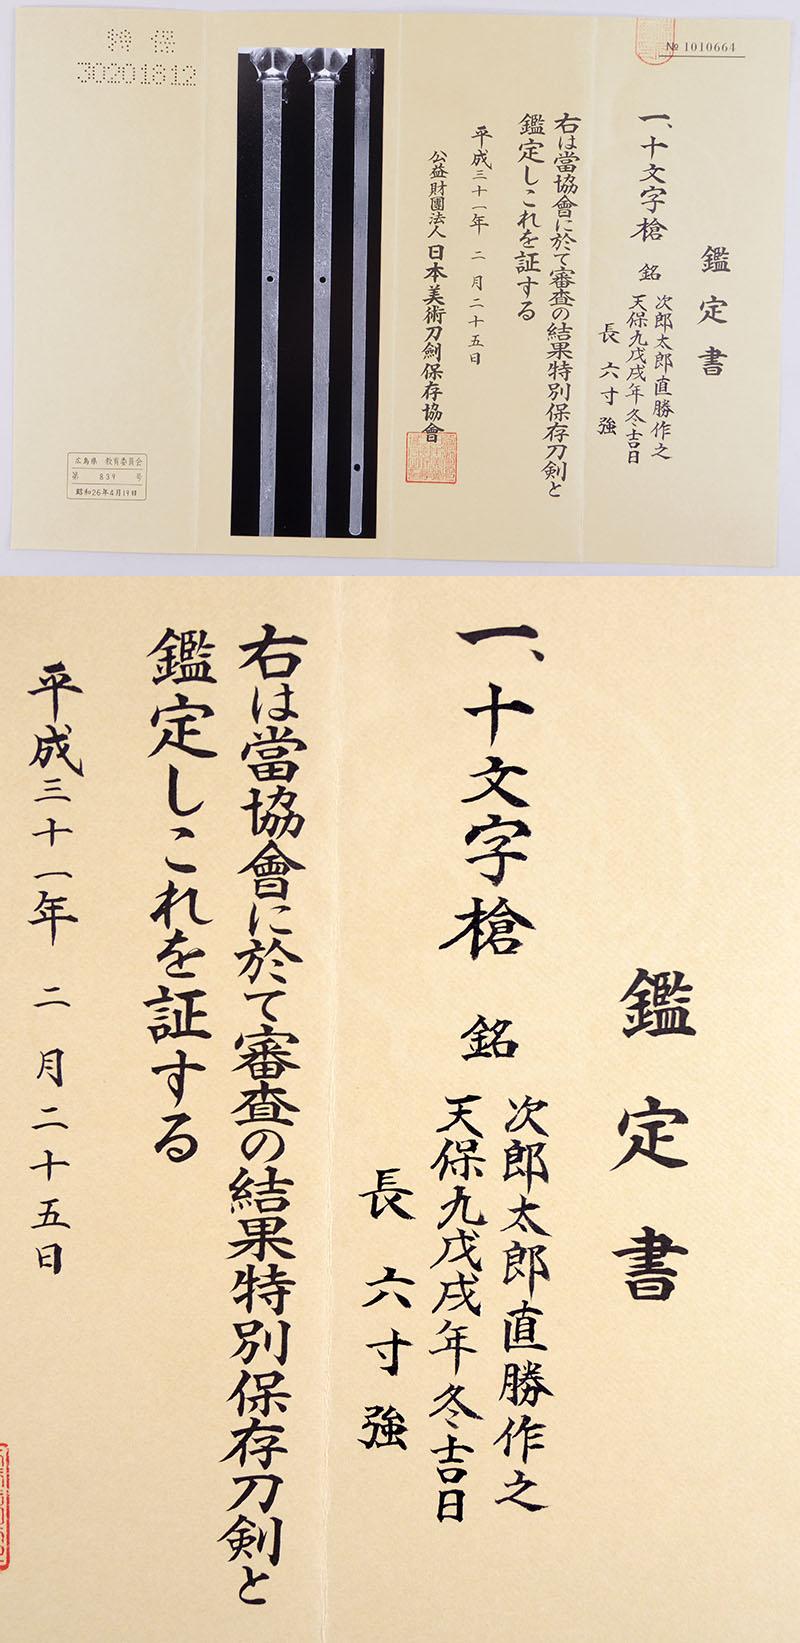 次郎太郎直勝作之 Picture of Certificate